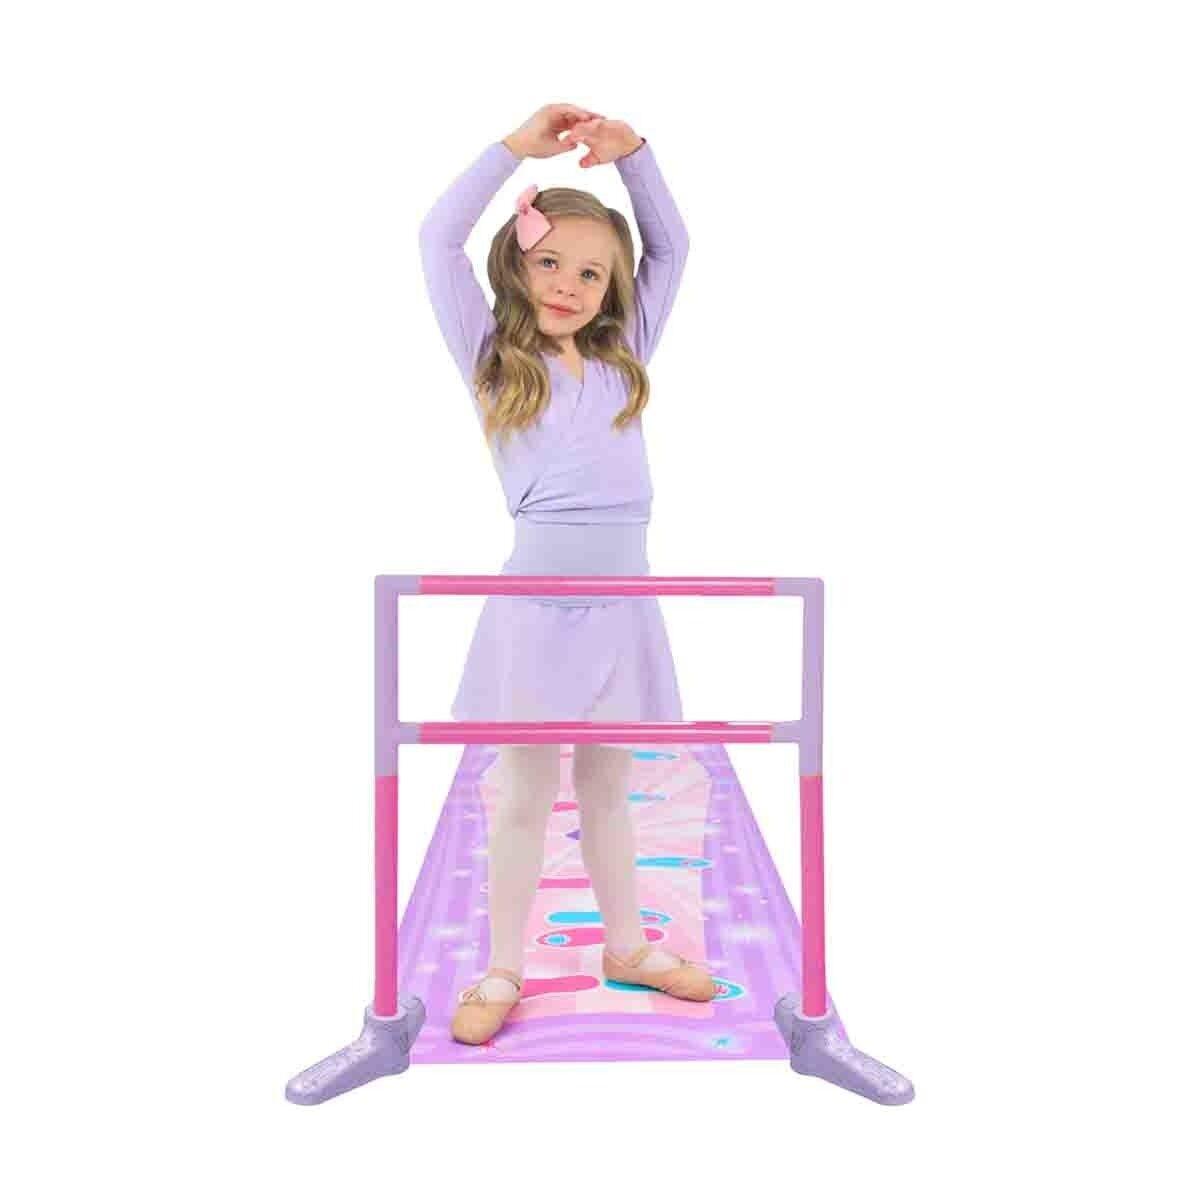 NEW Ballerina Dreamer Ballet Dancing Mat Studio Portable Barre Birthday Gift